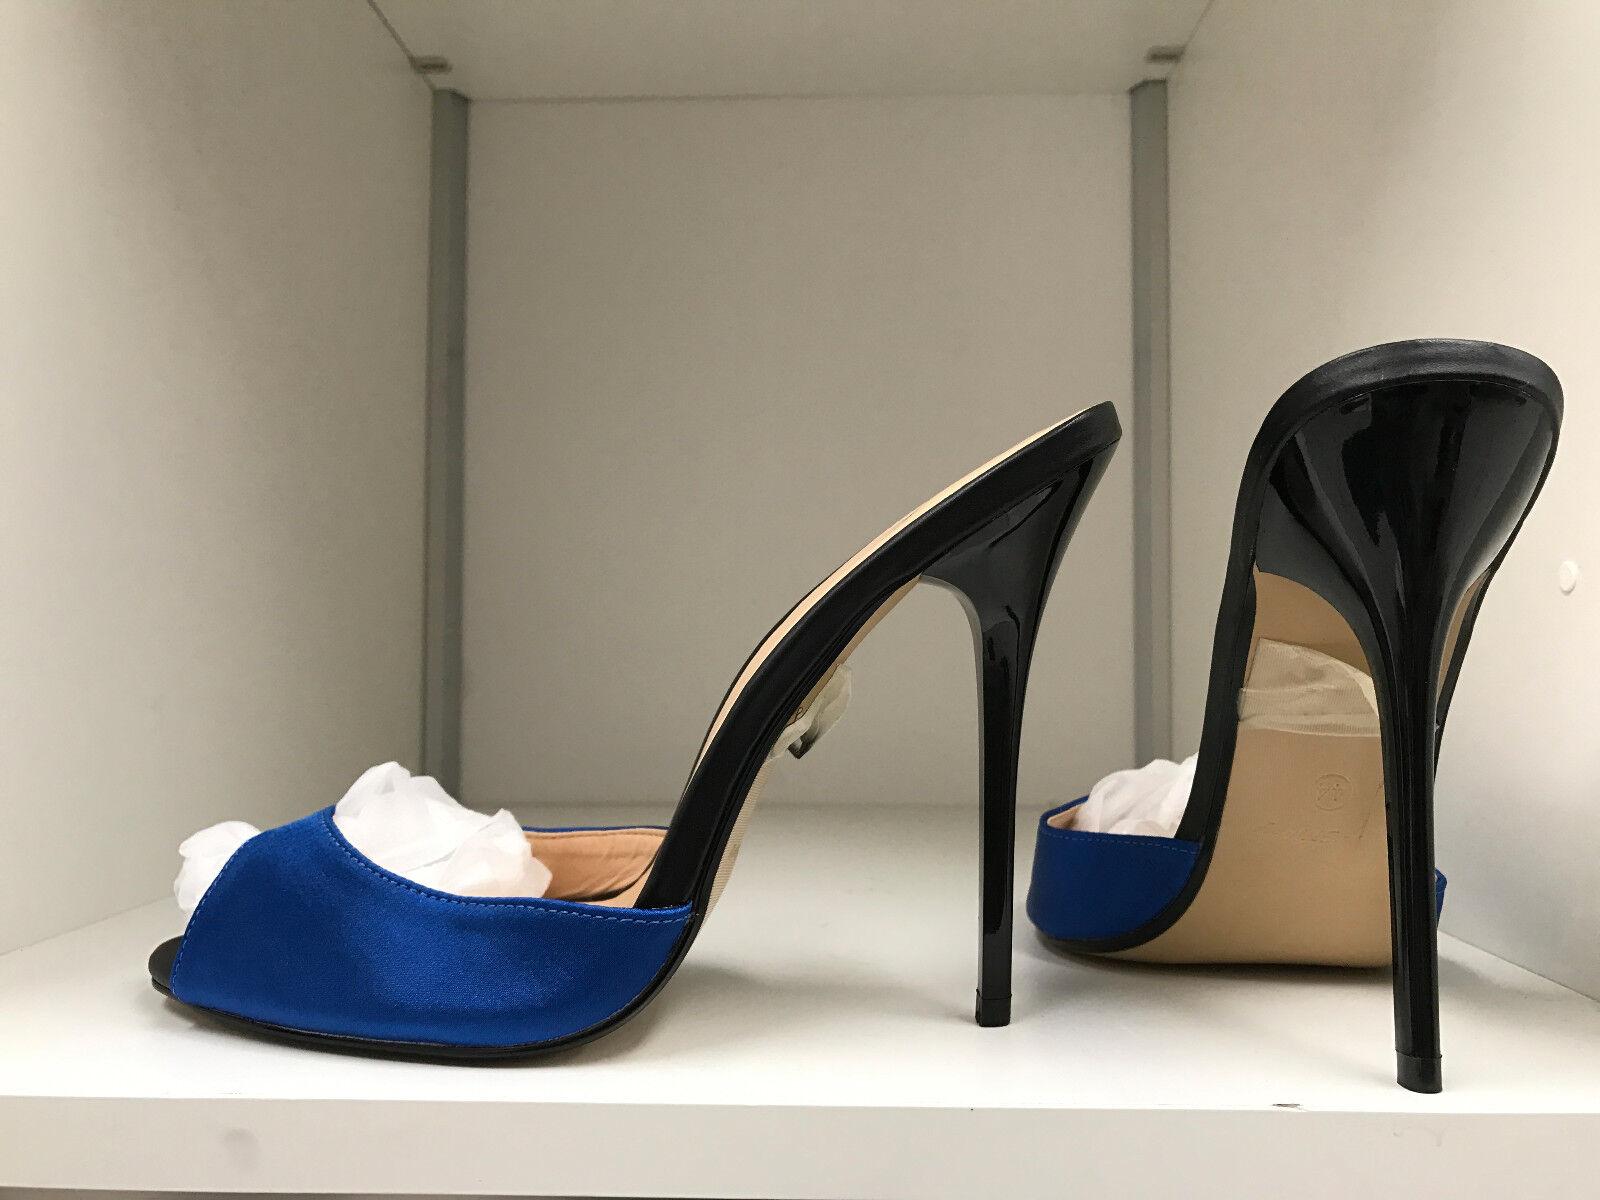 autentico 14 cm Sexy sky high high high heels blu blu blu satin sandals fetish high heels US12 43  costo effettivo